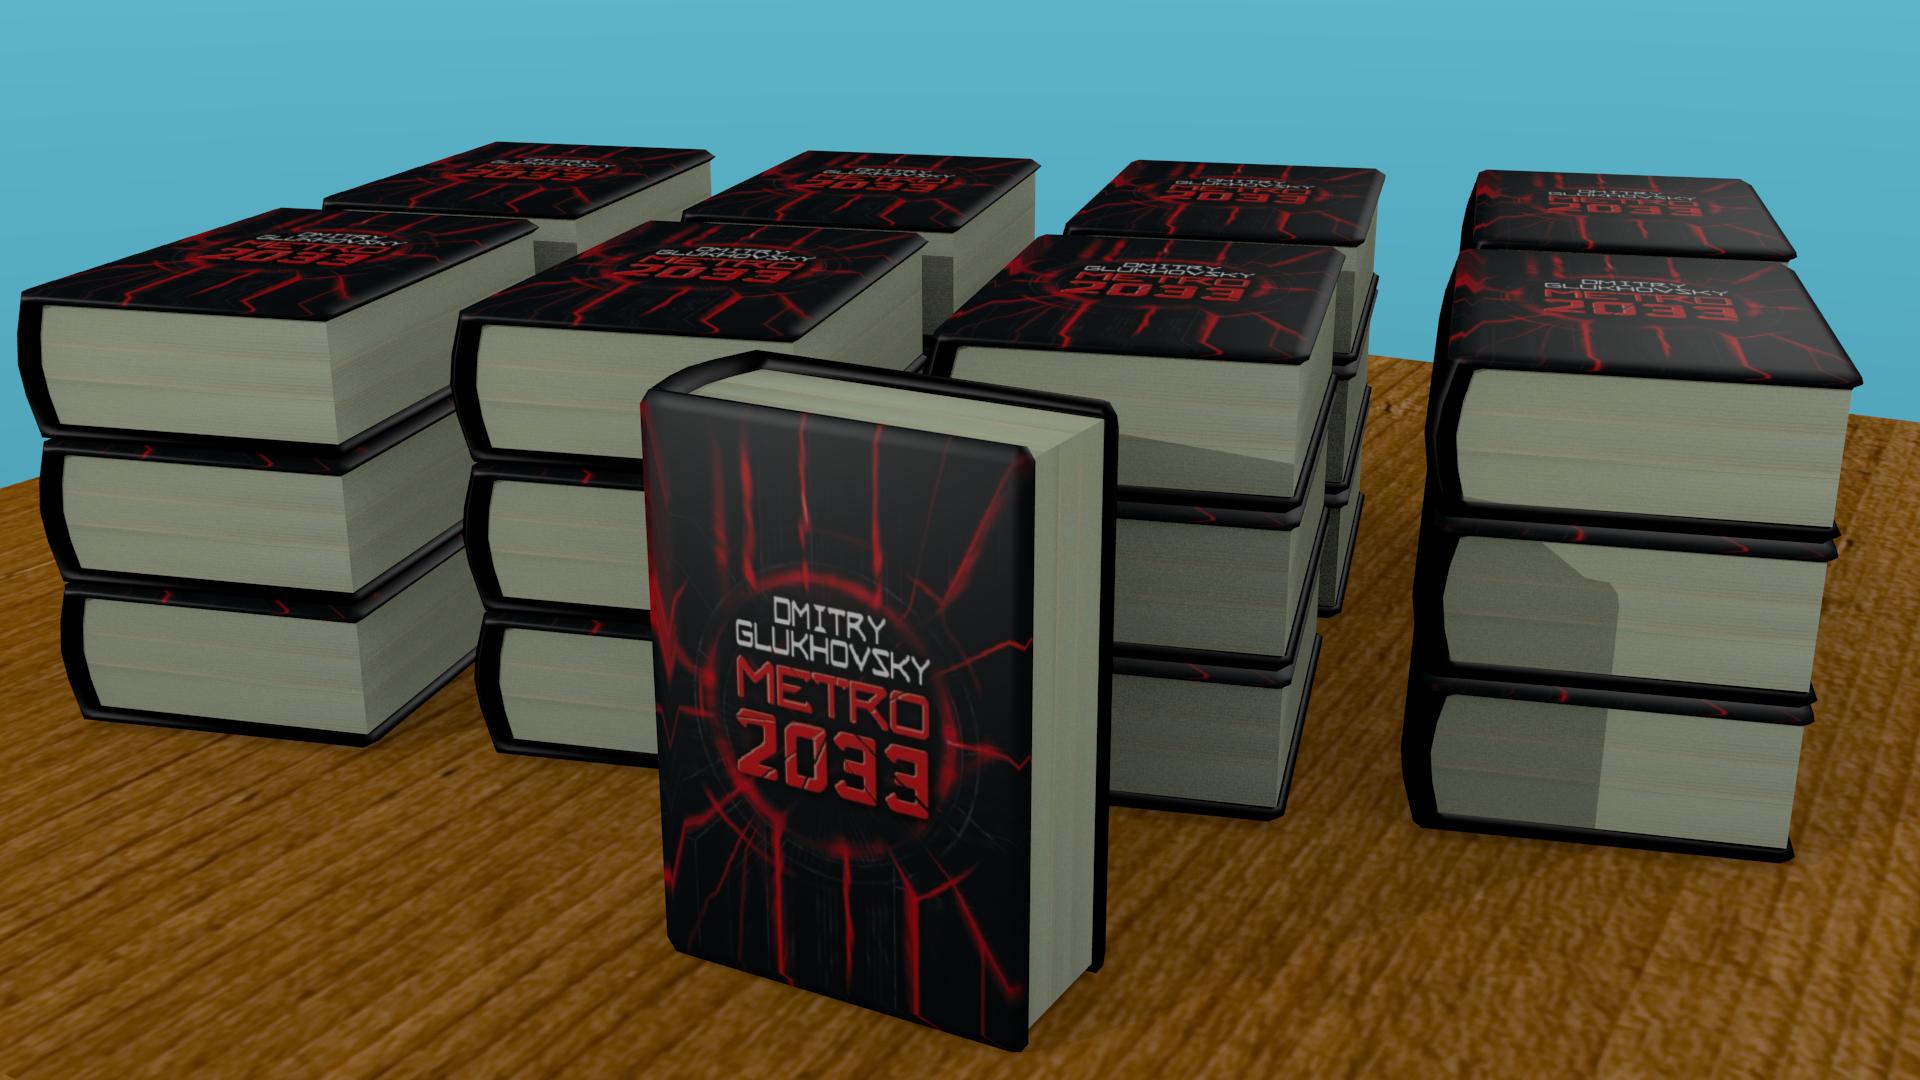 metro 2033 book